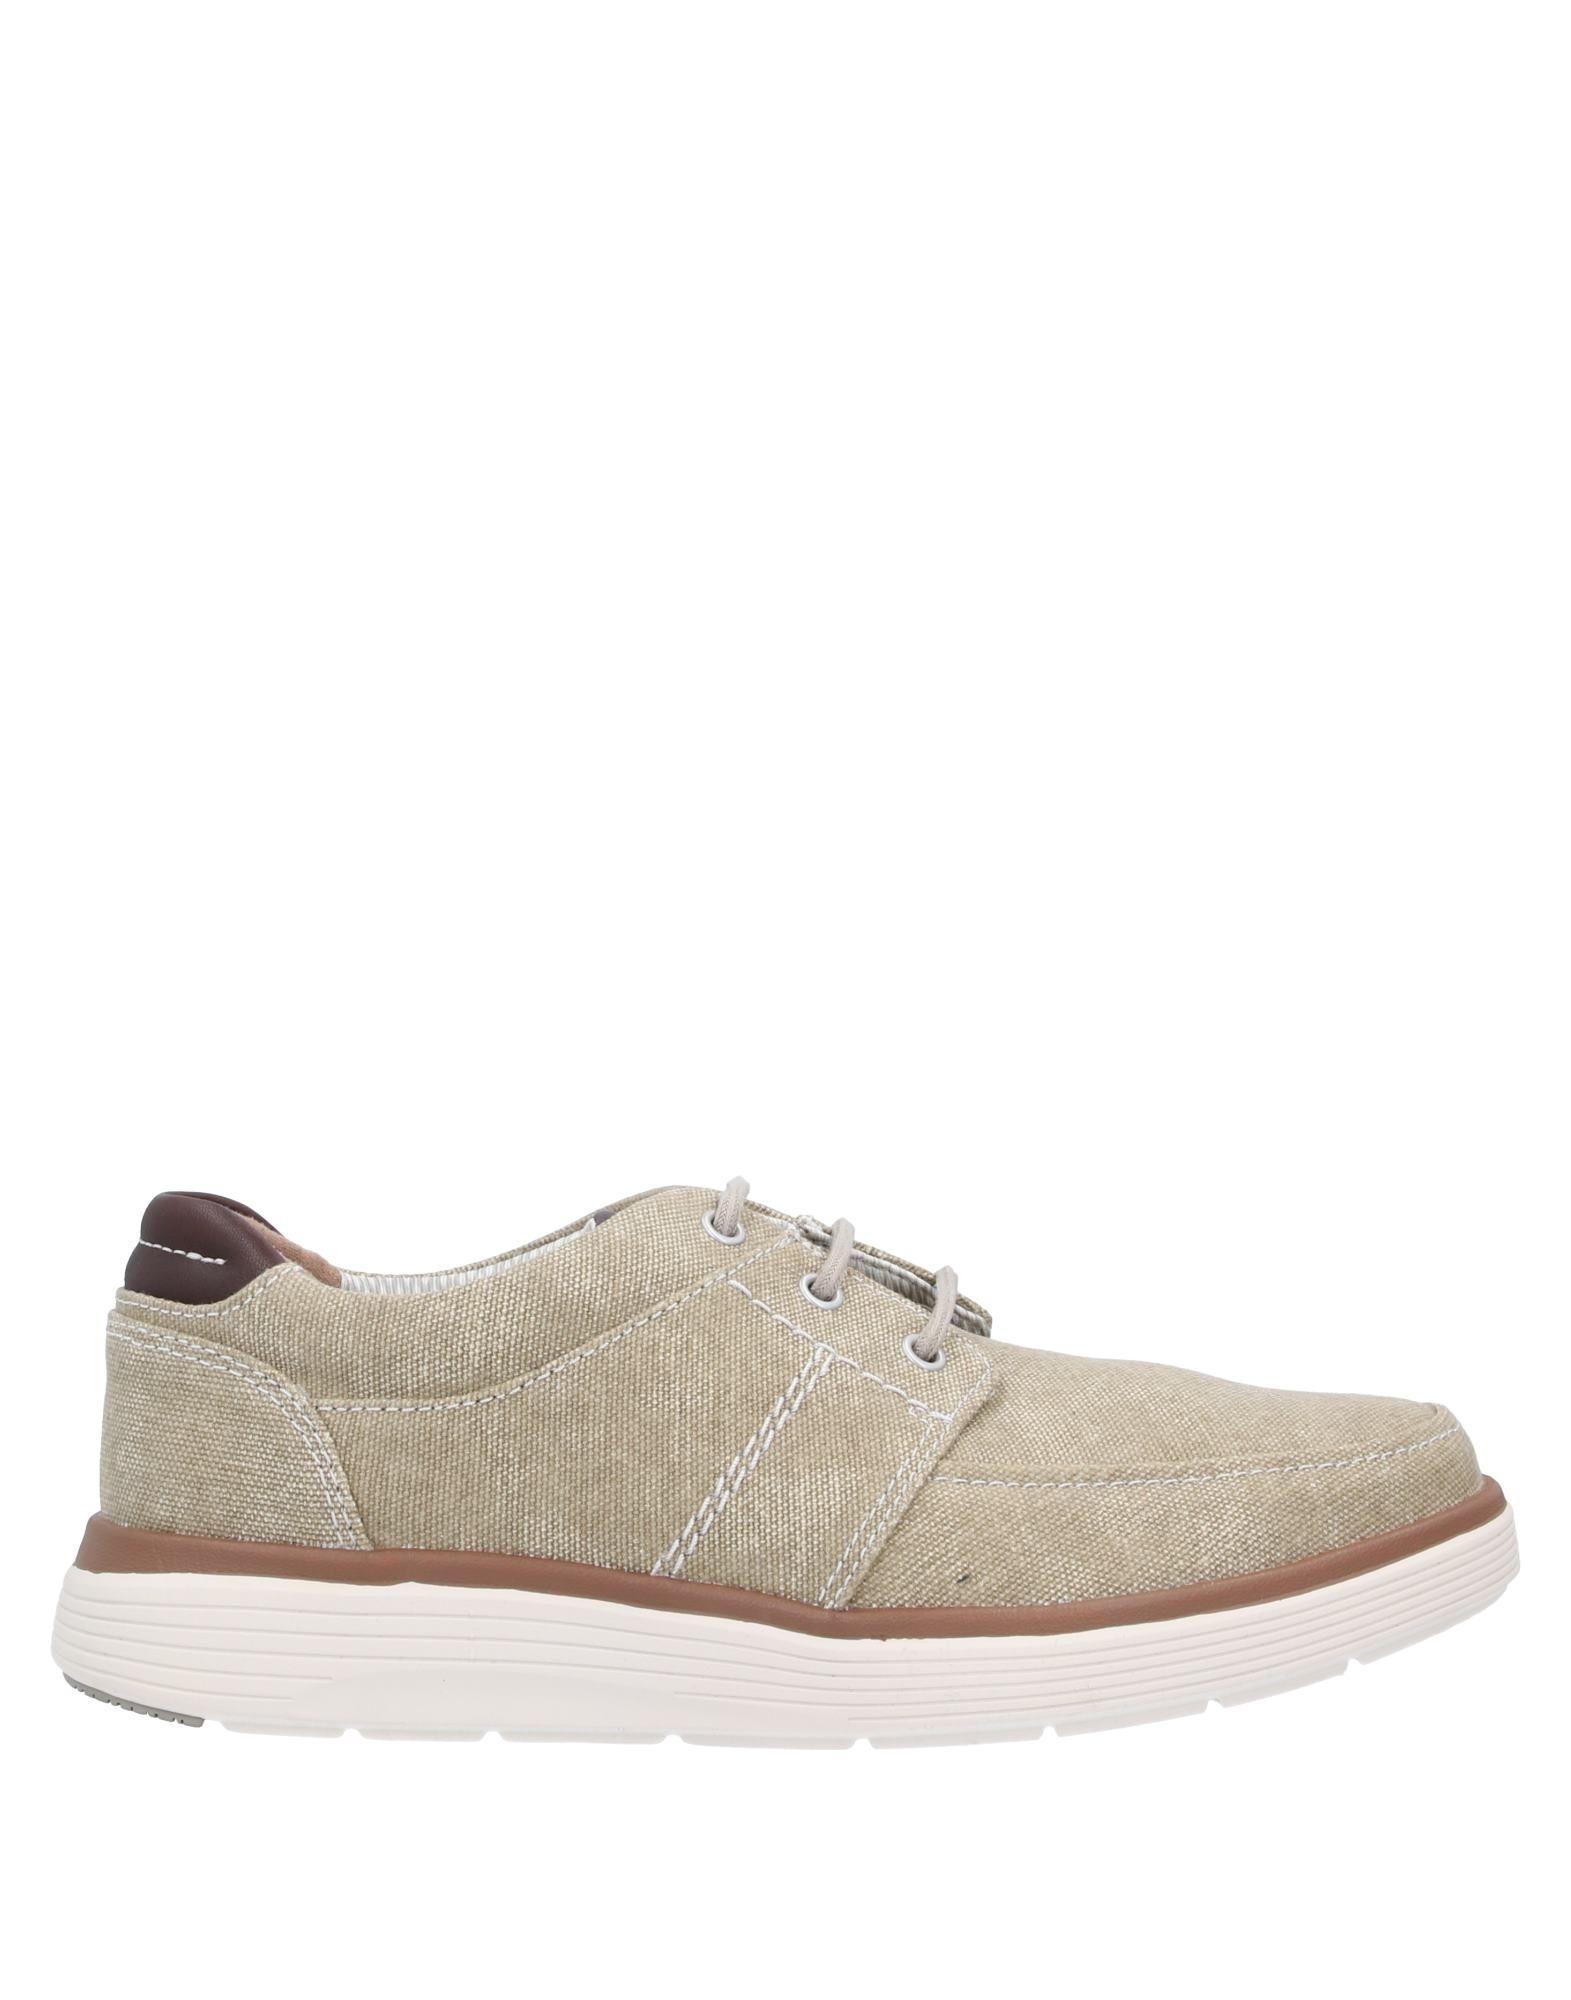 цена UNSTRUCTURED by CLARKS Обувь на шнурках онлайн в 2017 году